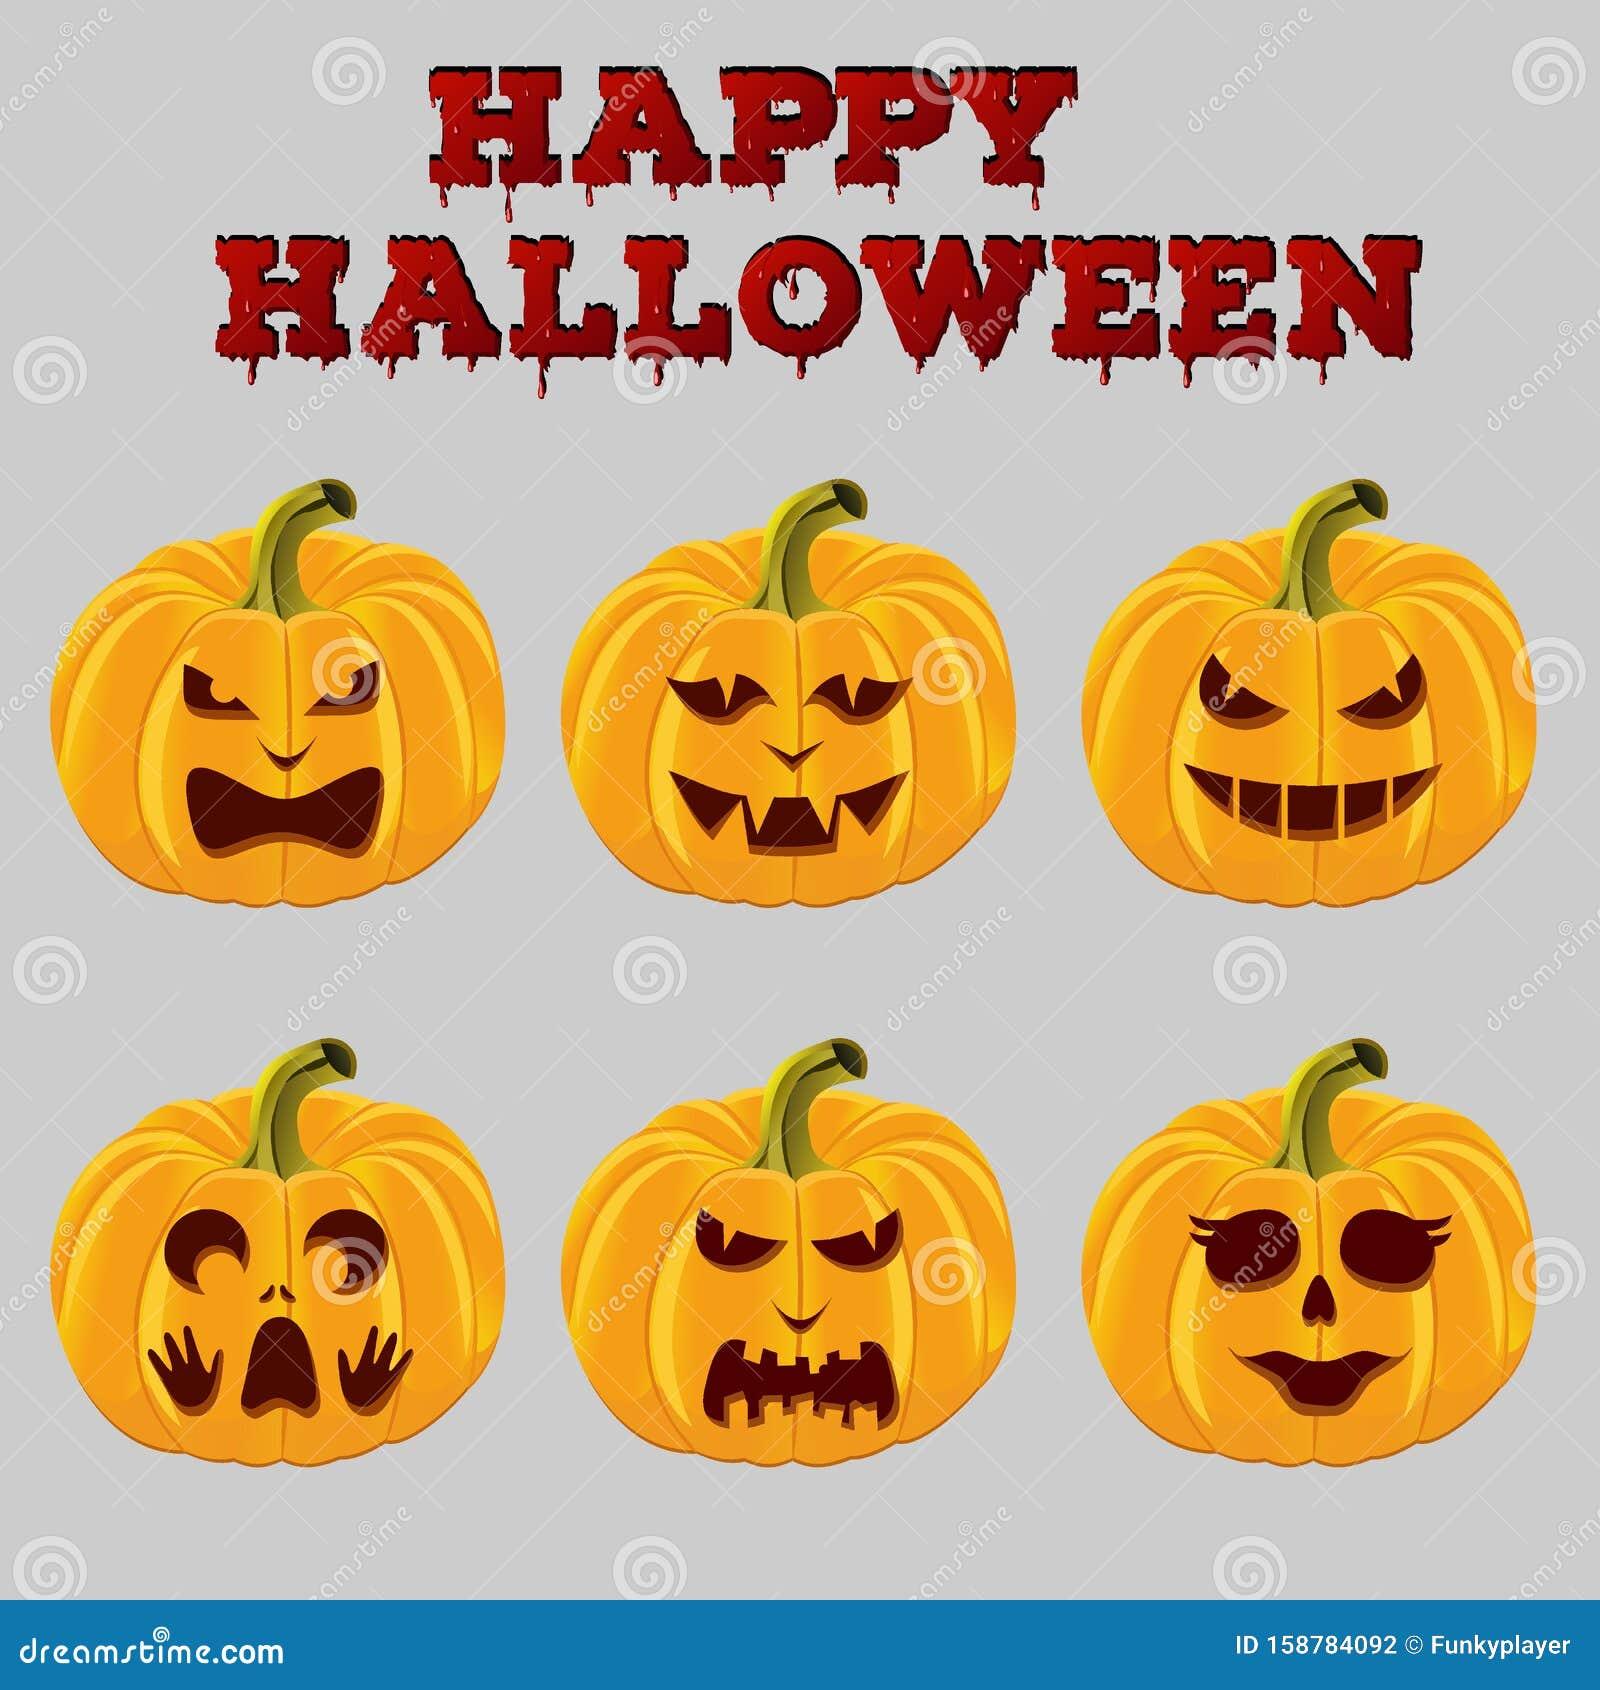 Cartoon Halloween Holiday Pumpkins. Jack O Lanterns Carved